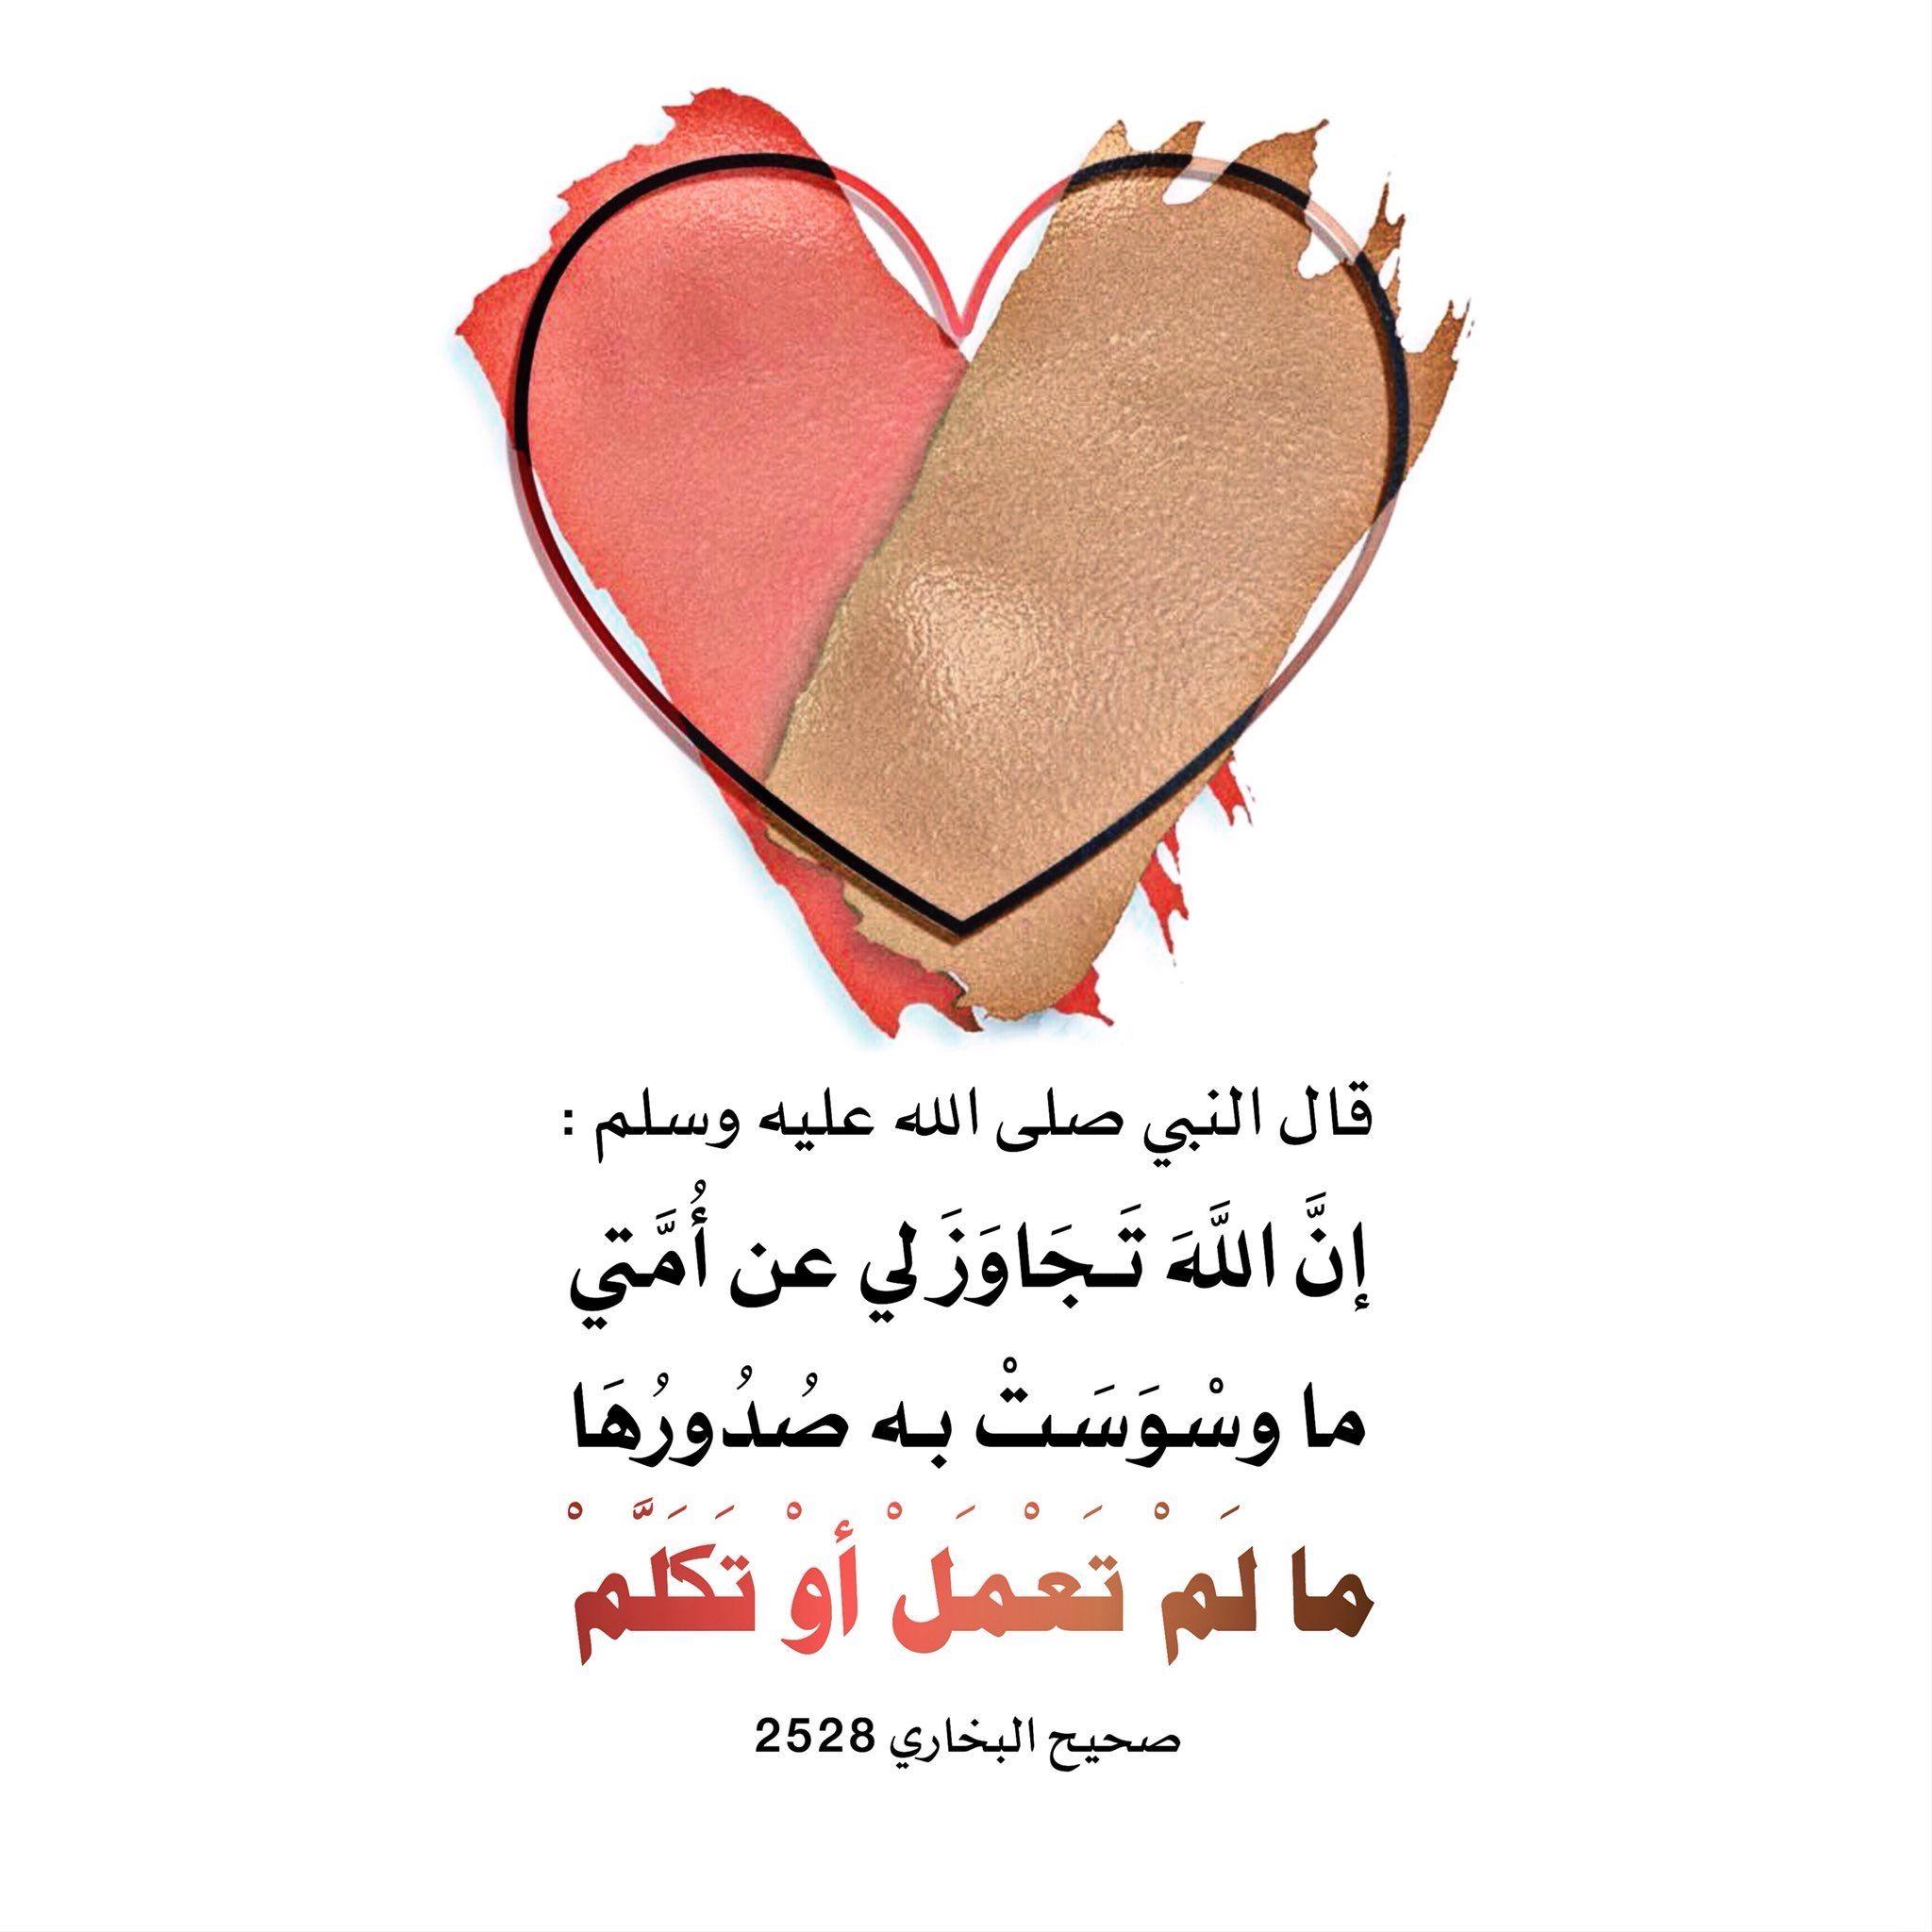 Pin By Omi Imo On أحاديث نبوية Islam Hadith Hadith Islam